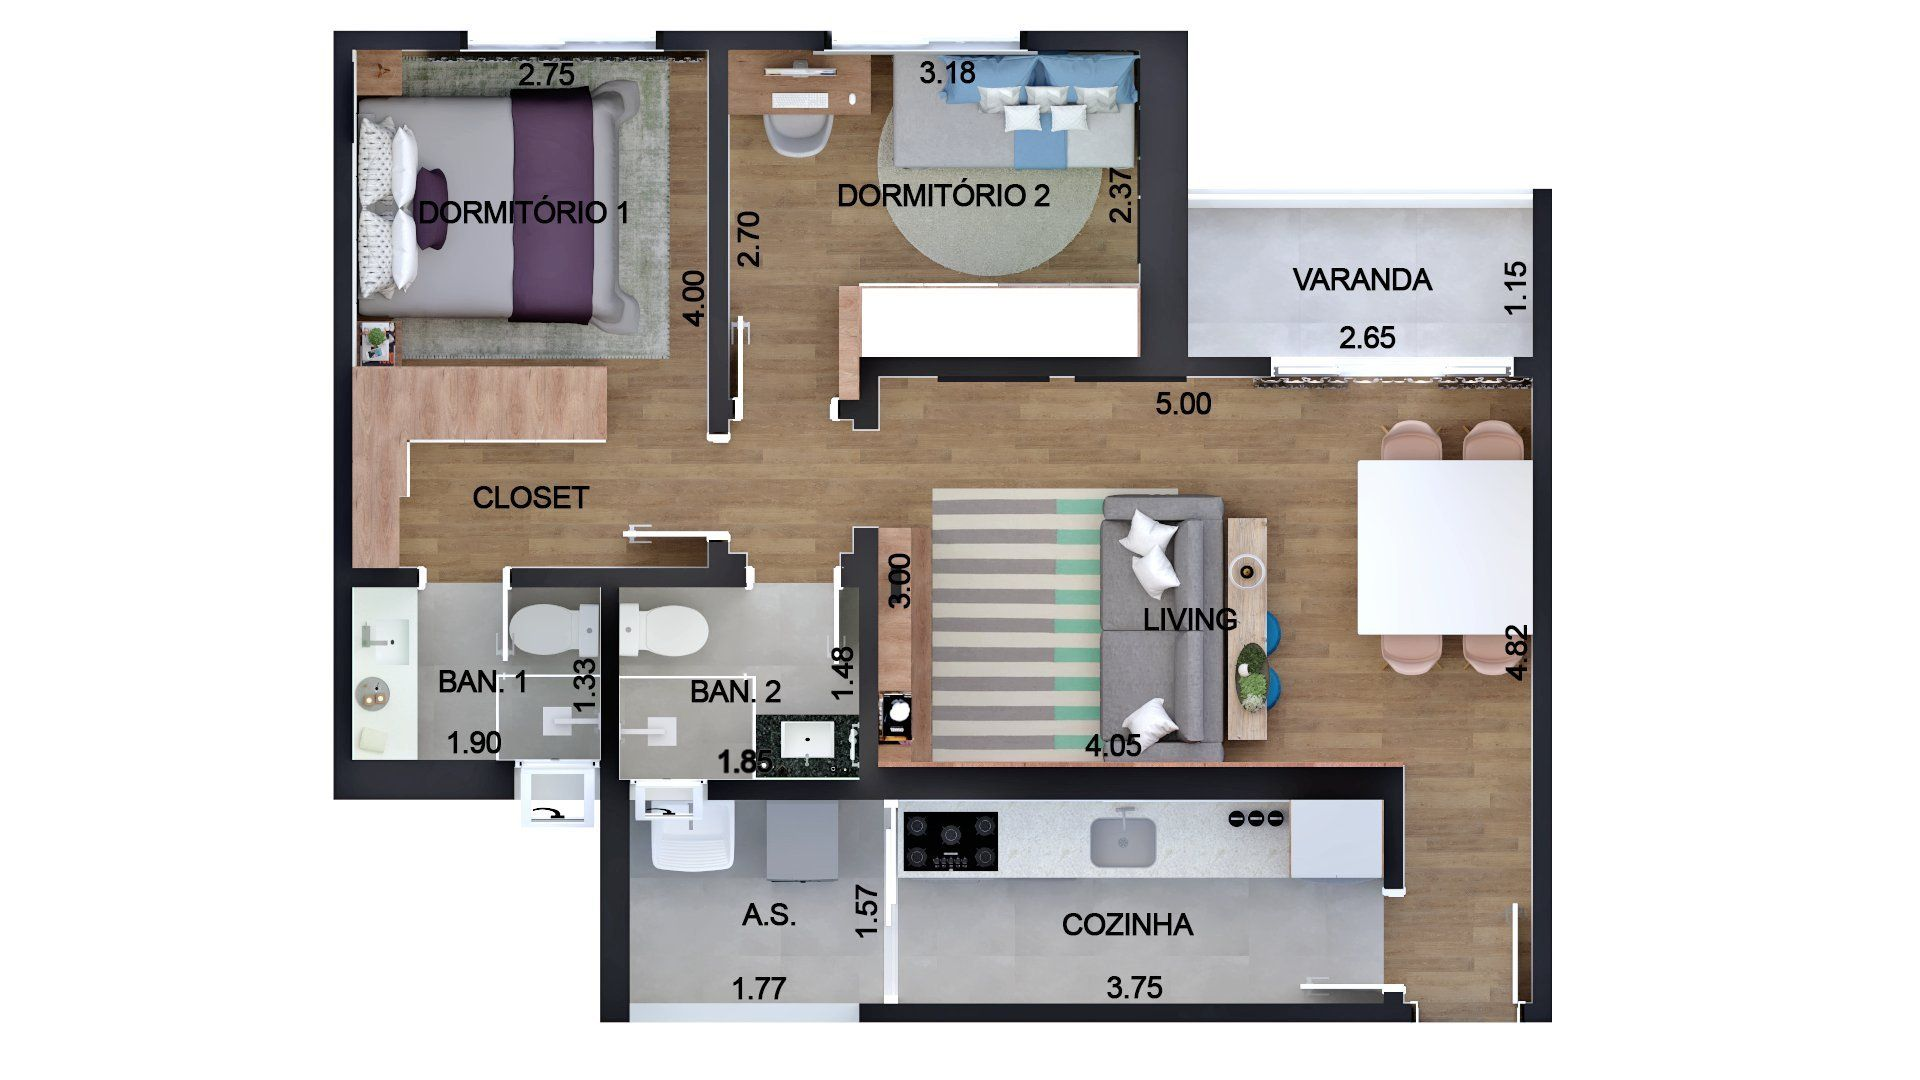 Planta do Edifício Cortina D'ampezzo. floorplan